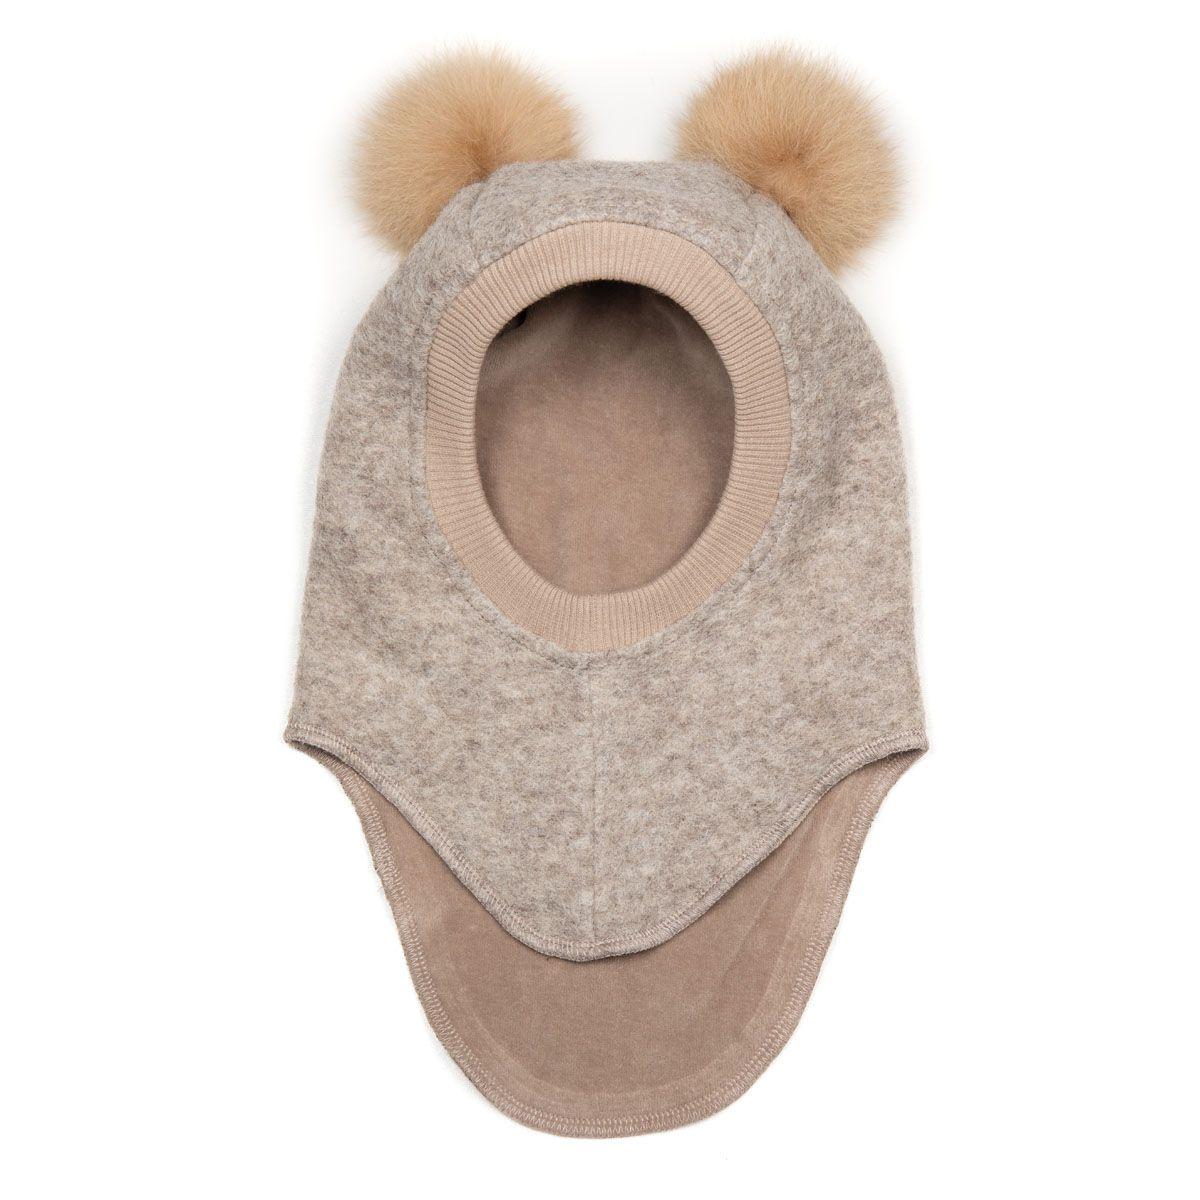 Huttelihut BIG BEAR, Wool Balaclava - Camel